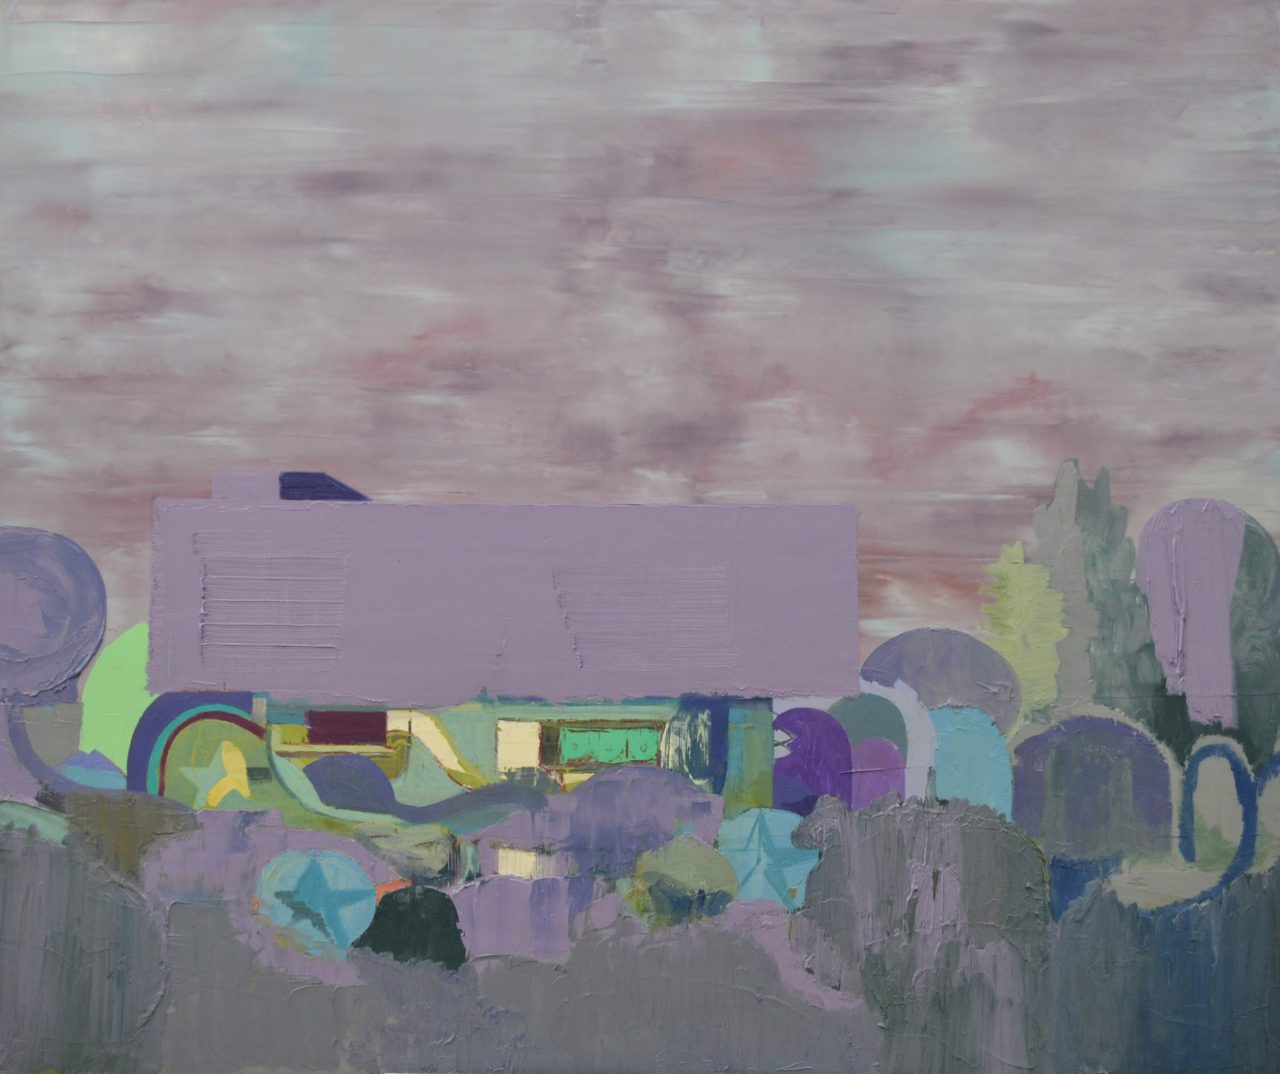 House with garden, 2015. Oil on linen, 100x120cm